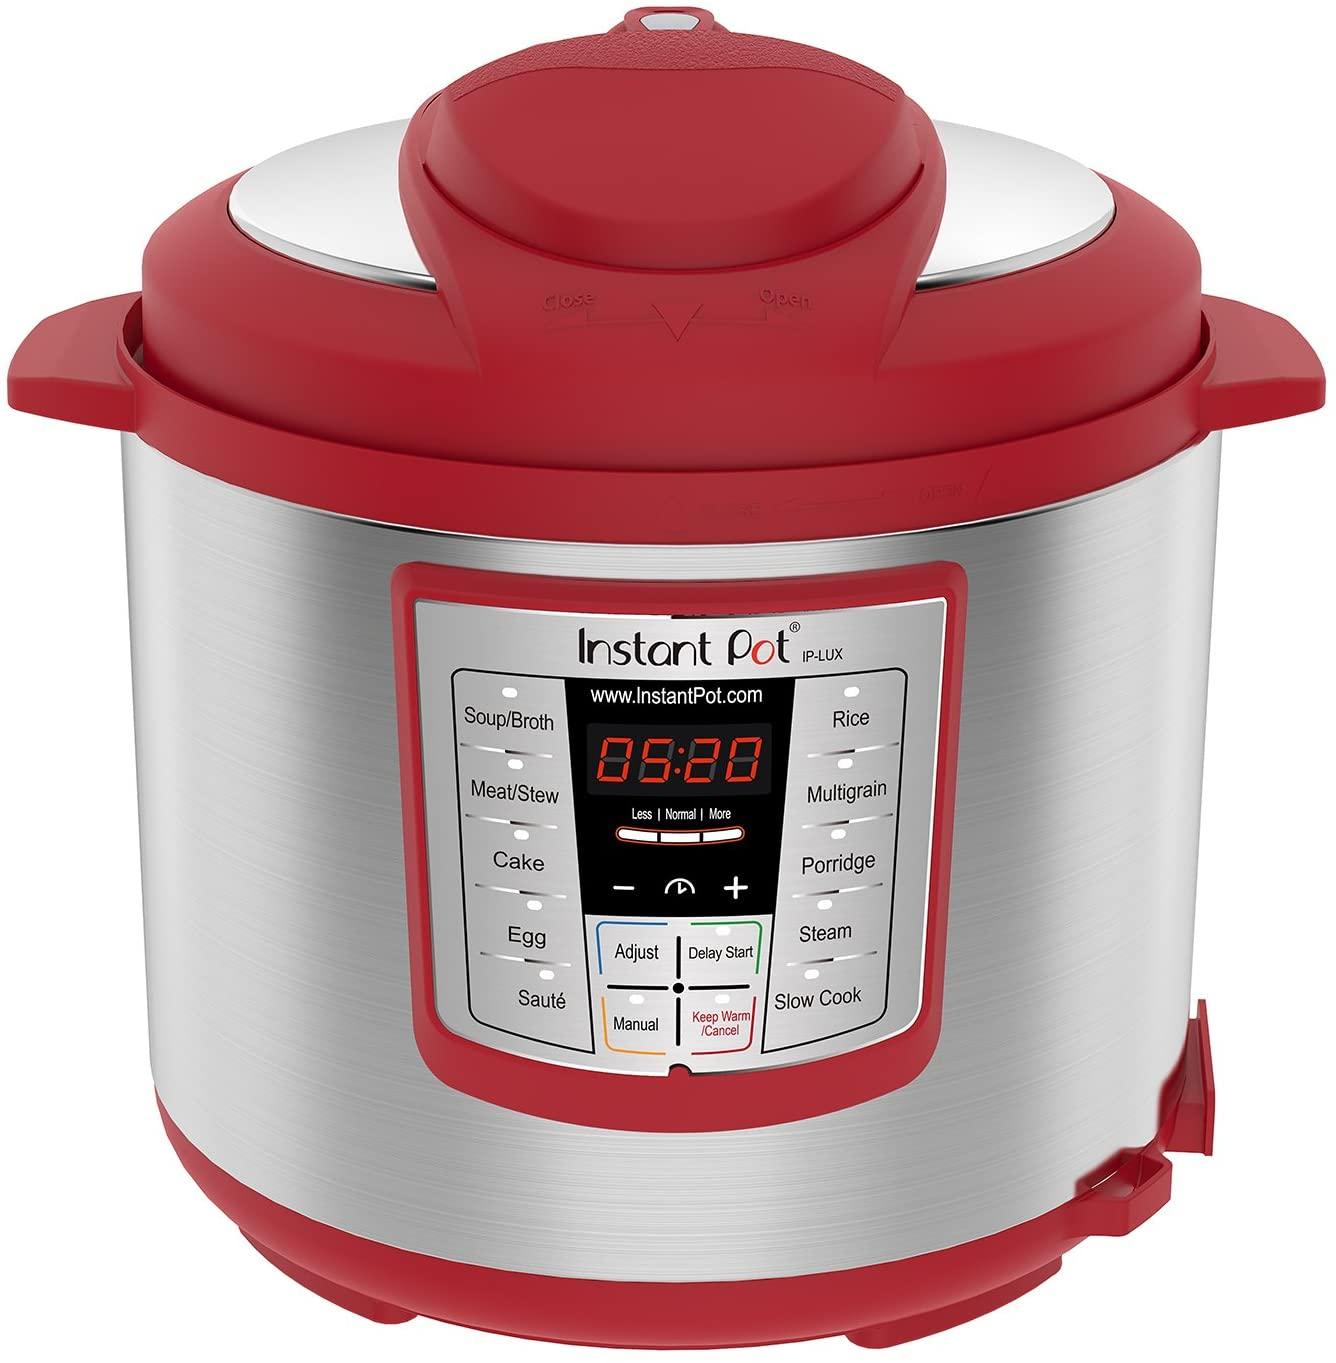 Instant Pot六合一电压力锅,很适合小家庭